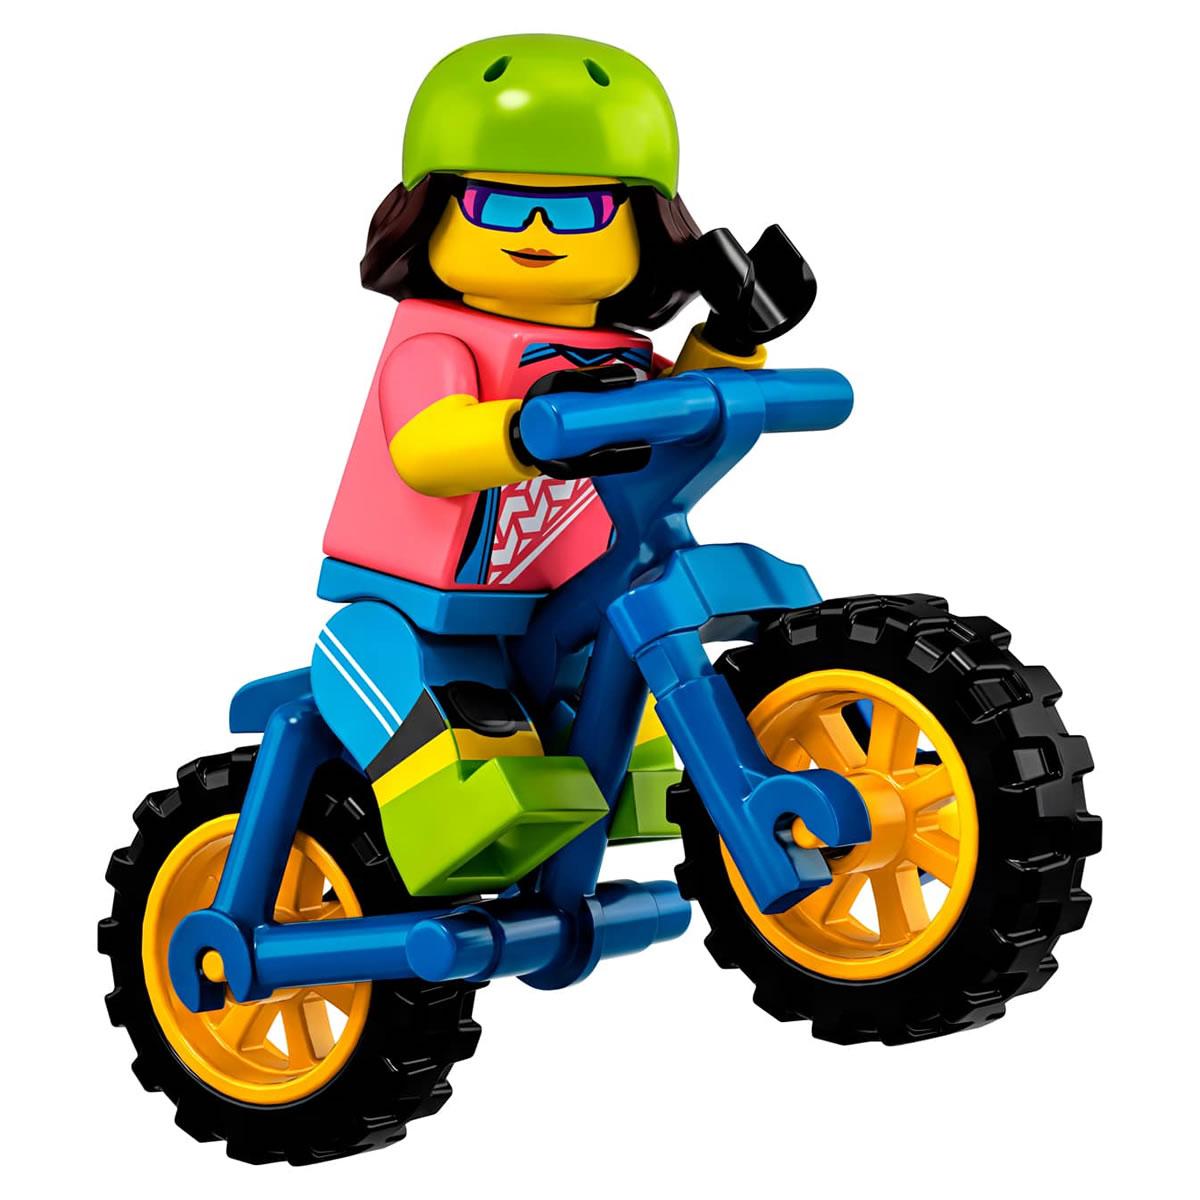 lego-minifiguren-sammelserie-collectible-minifigures-serie-19-71025-2019-8 zusammengebaut.com